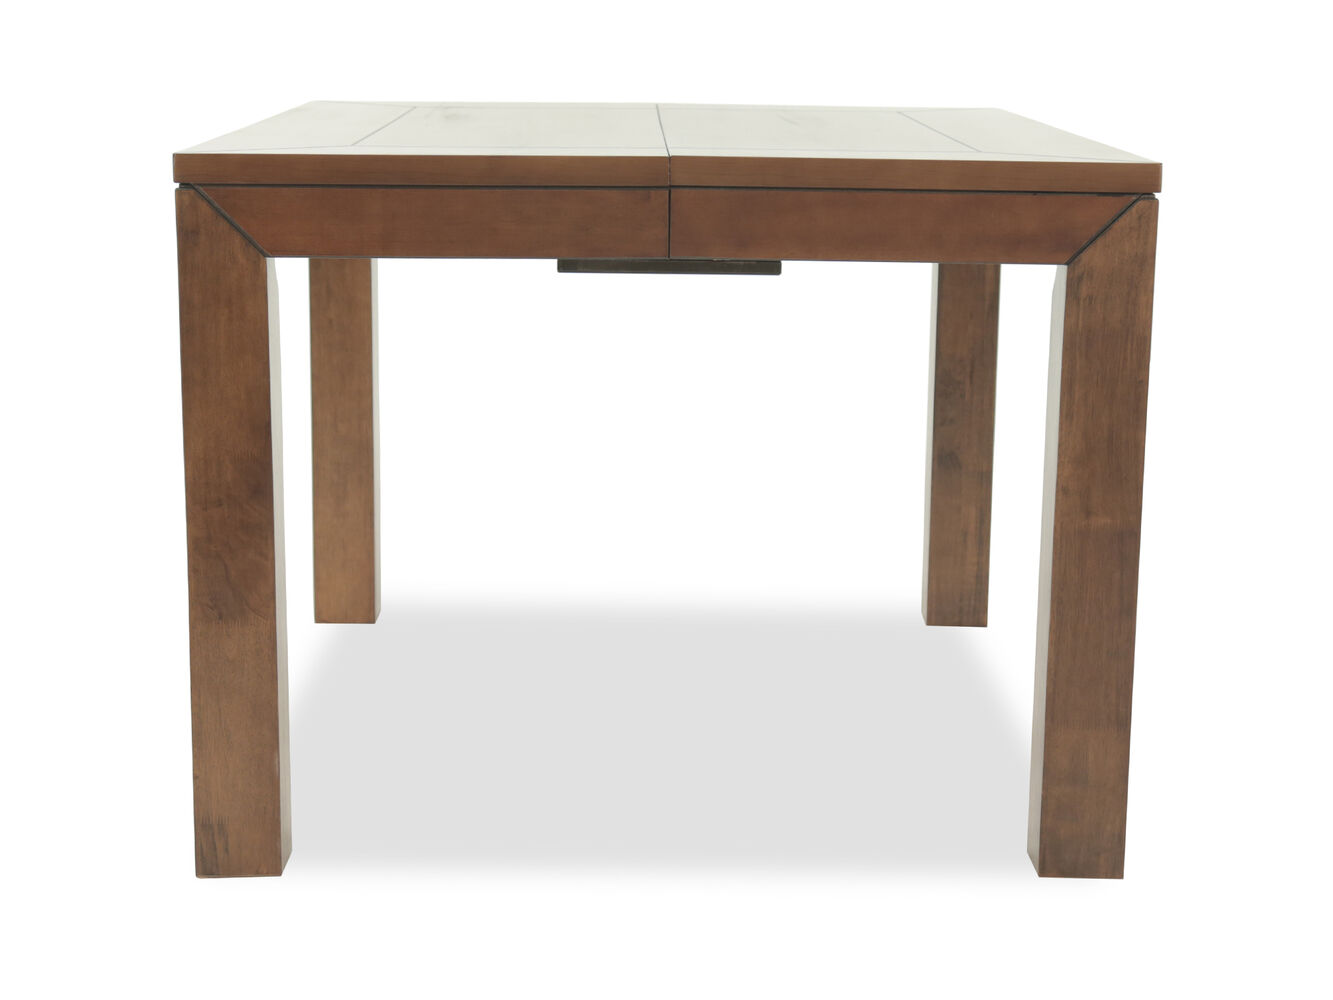 Keller Bedroom Furniture  PierPointSpringscom - Bedroom furniture charlotte nc